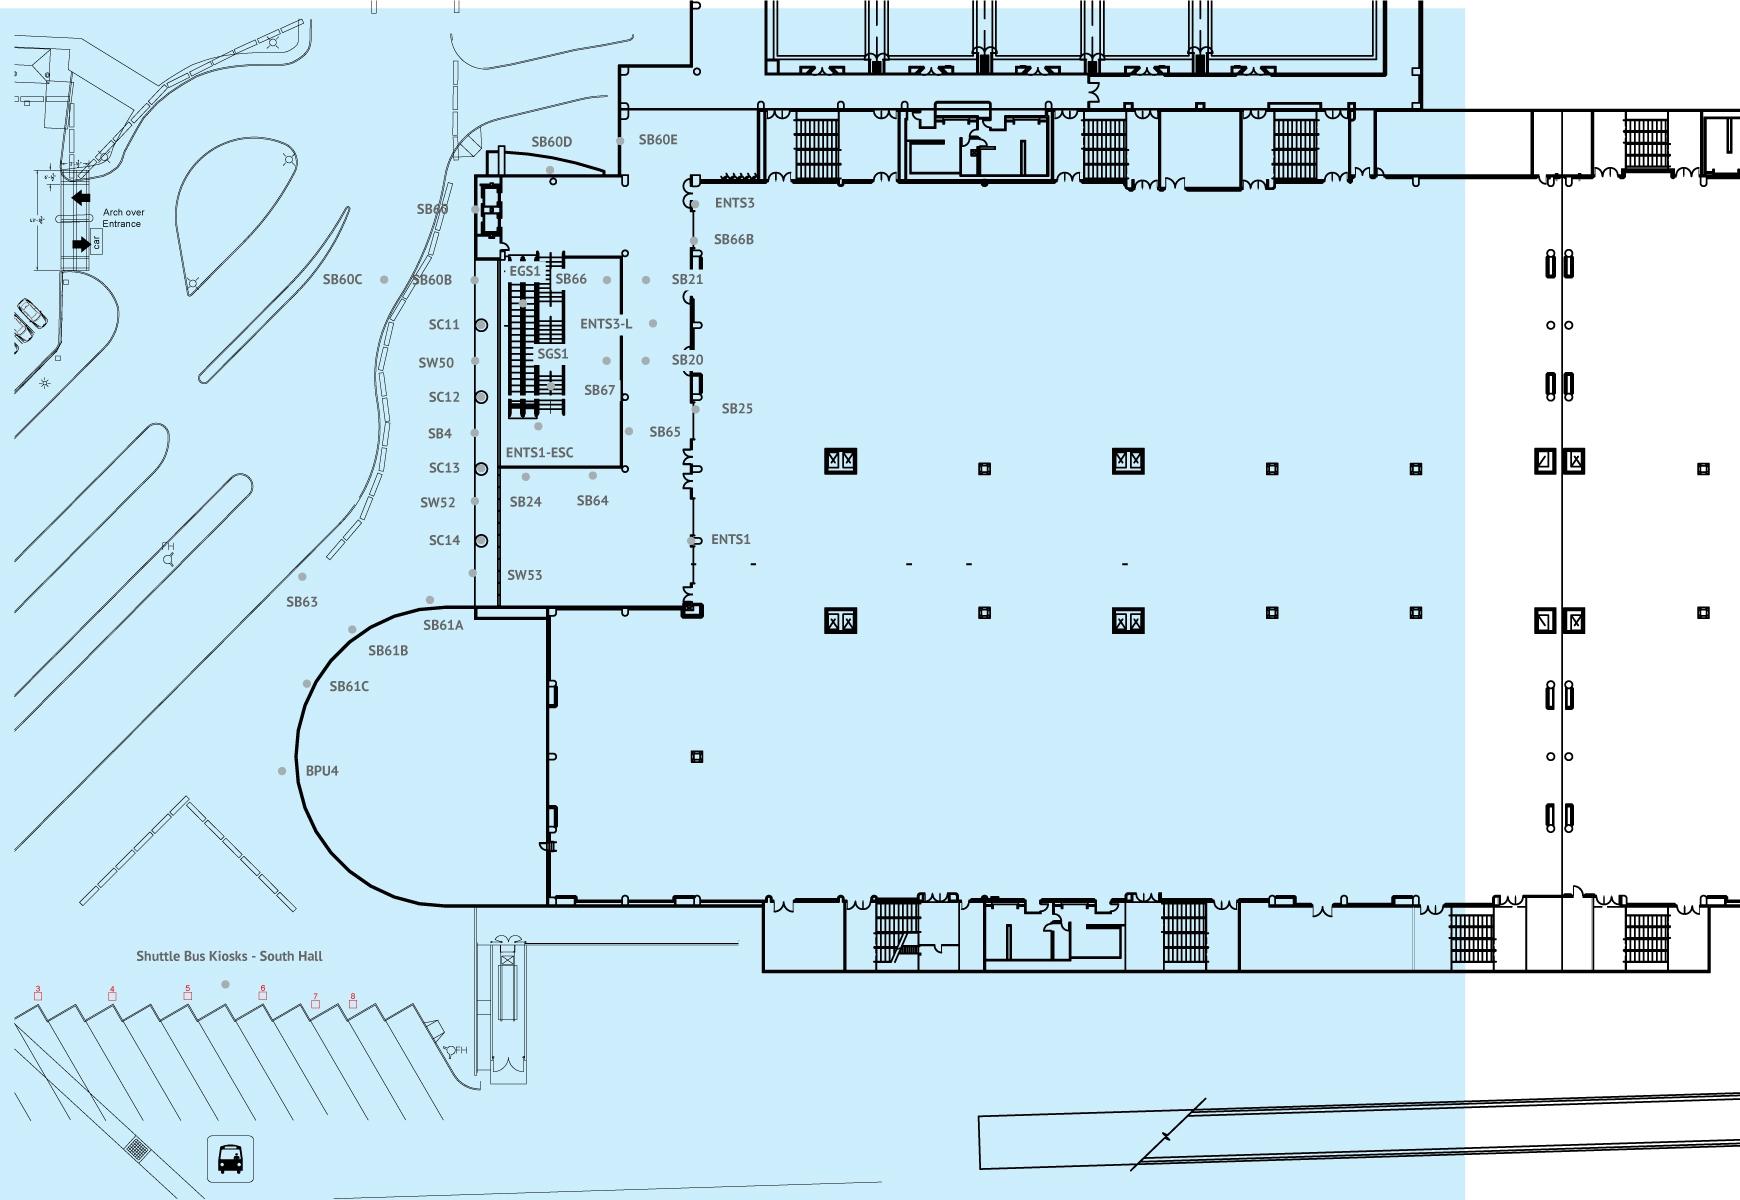 las vegas convention center floor plan vegas home plans sands expo convention center floor plan expo home plans